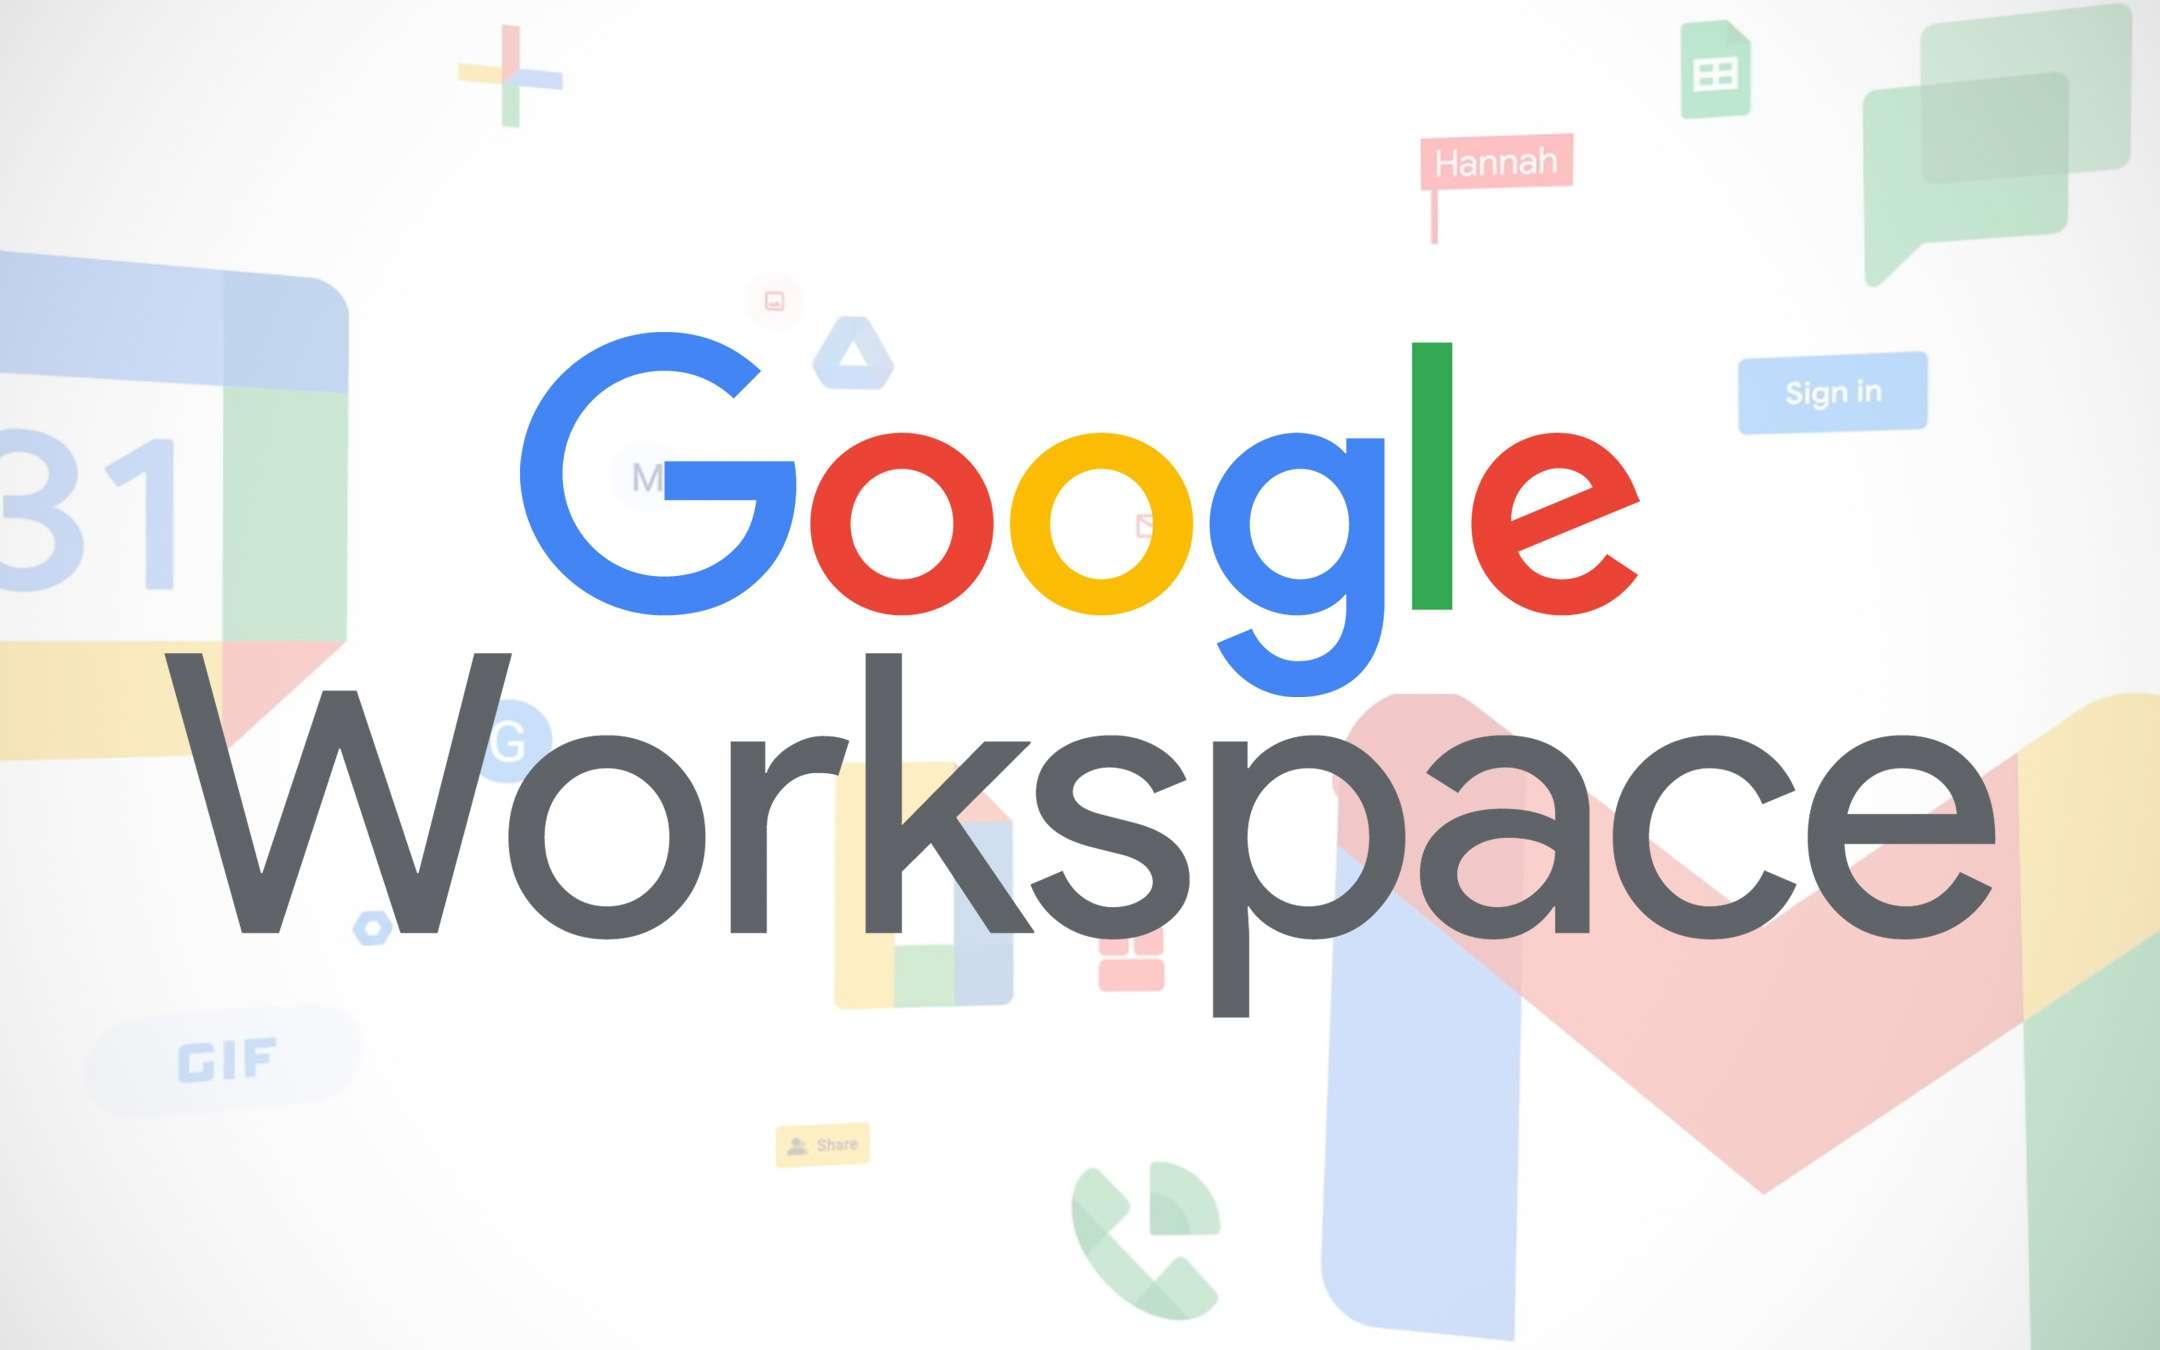 Google Workspace sarà disponibile per tutti gratis